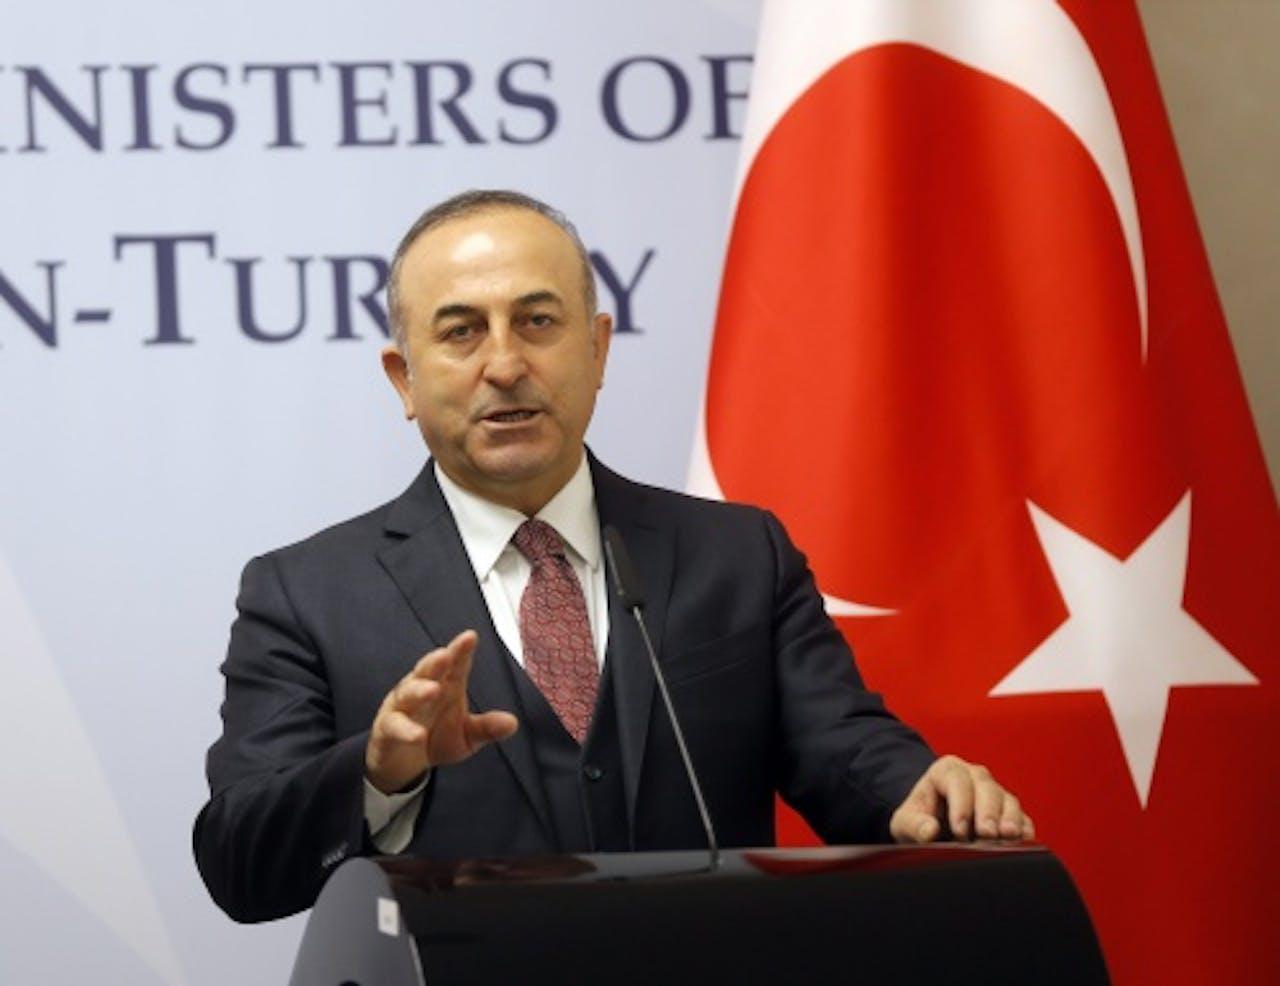 Mevlüt Cavusoglu, Turkse minister van Buitenlandse Zaken. EPA